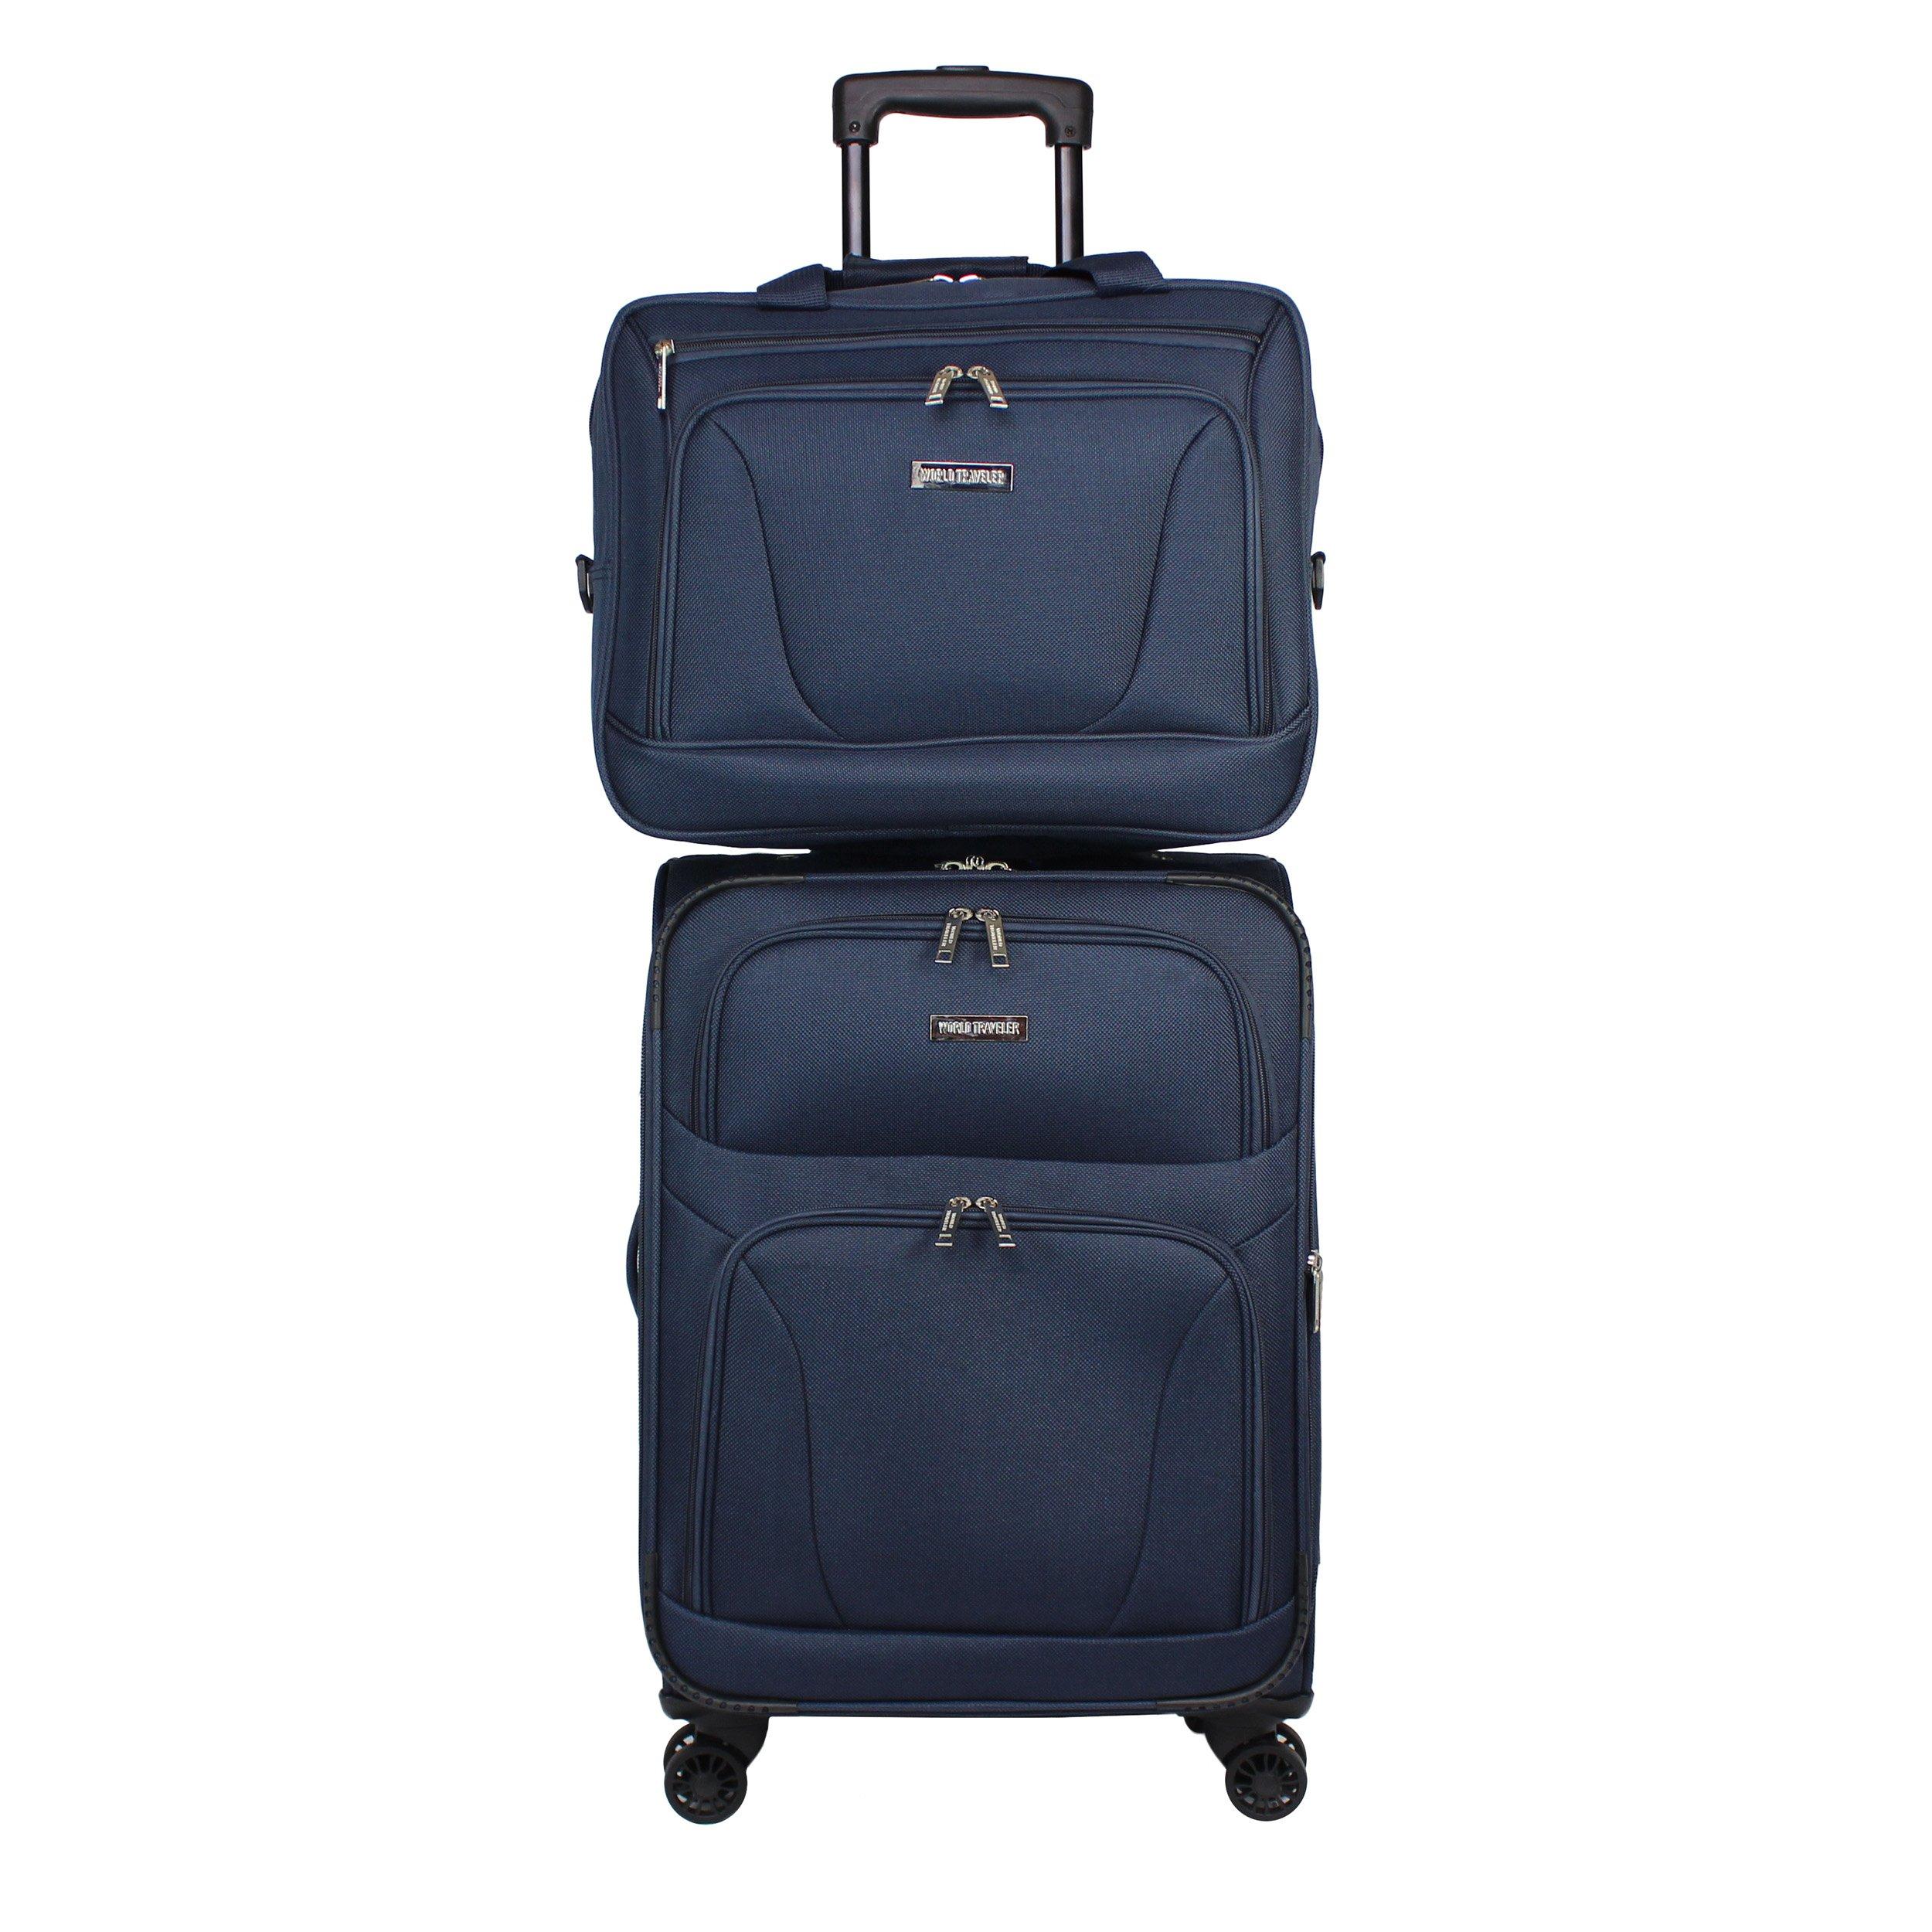 World Traveler Embarque Lightweight 2-Piece Carry-on Spinner Luggage Set - Navy